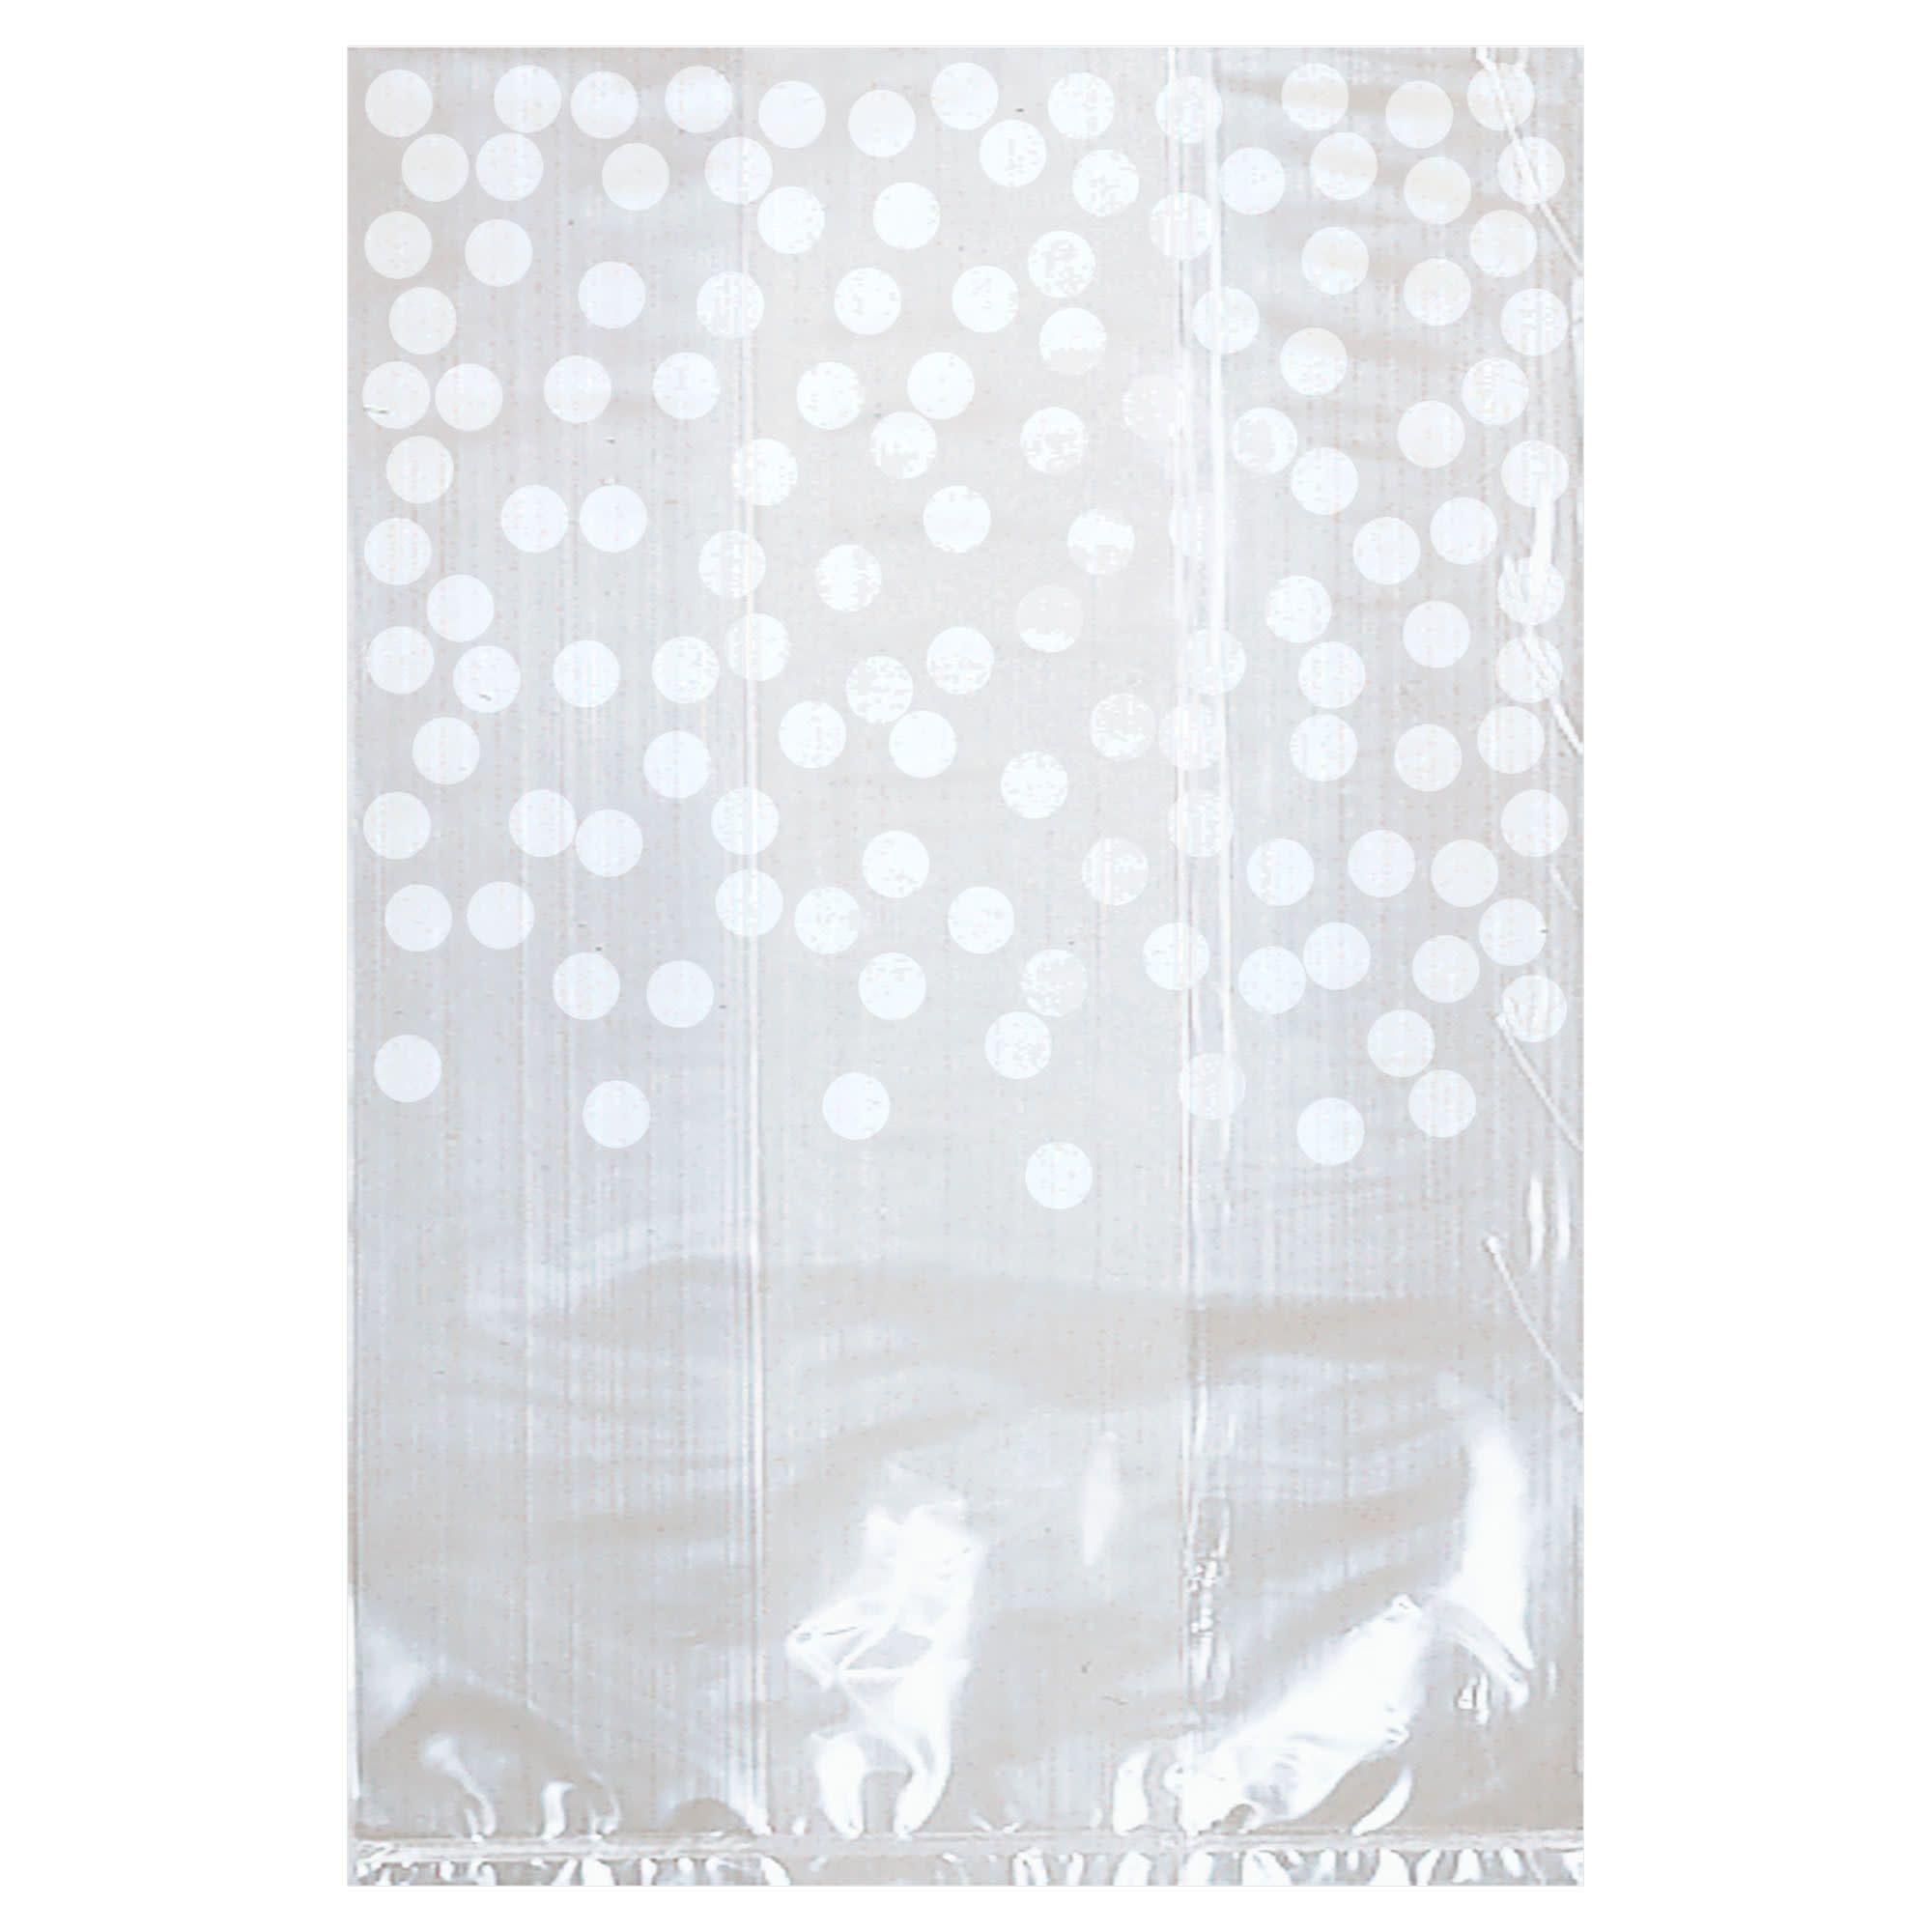 White Cello Bag W/Dots